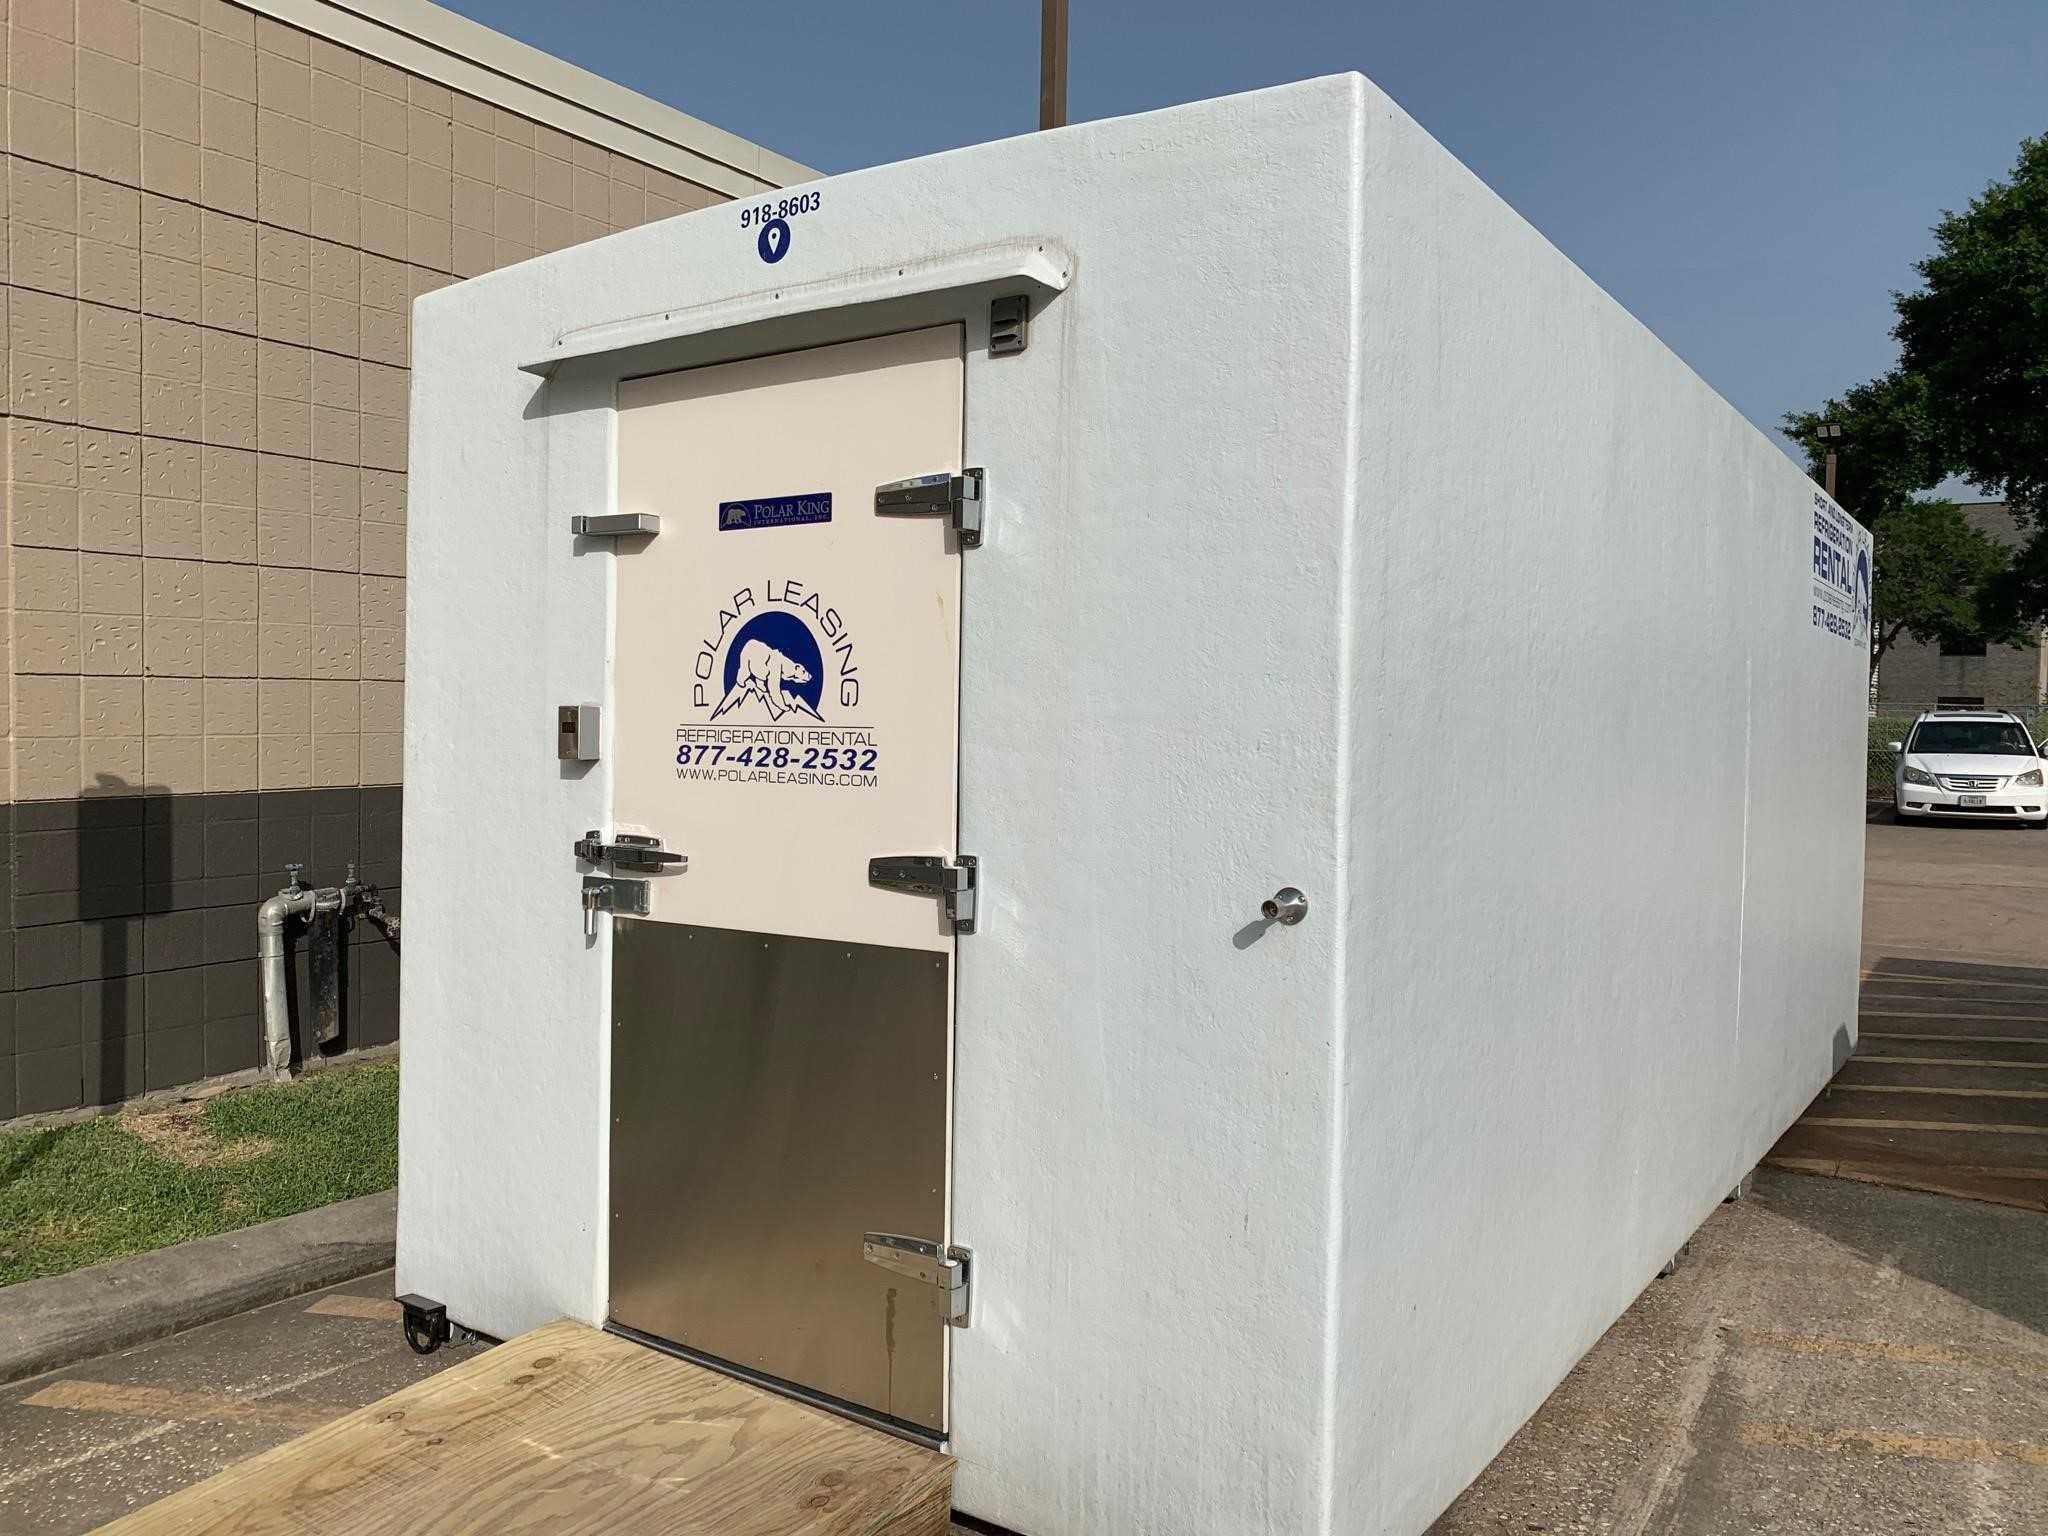 Webb County morgue at capacity amid surge of deaths due to COVID, border crossings